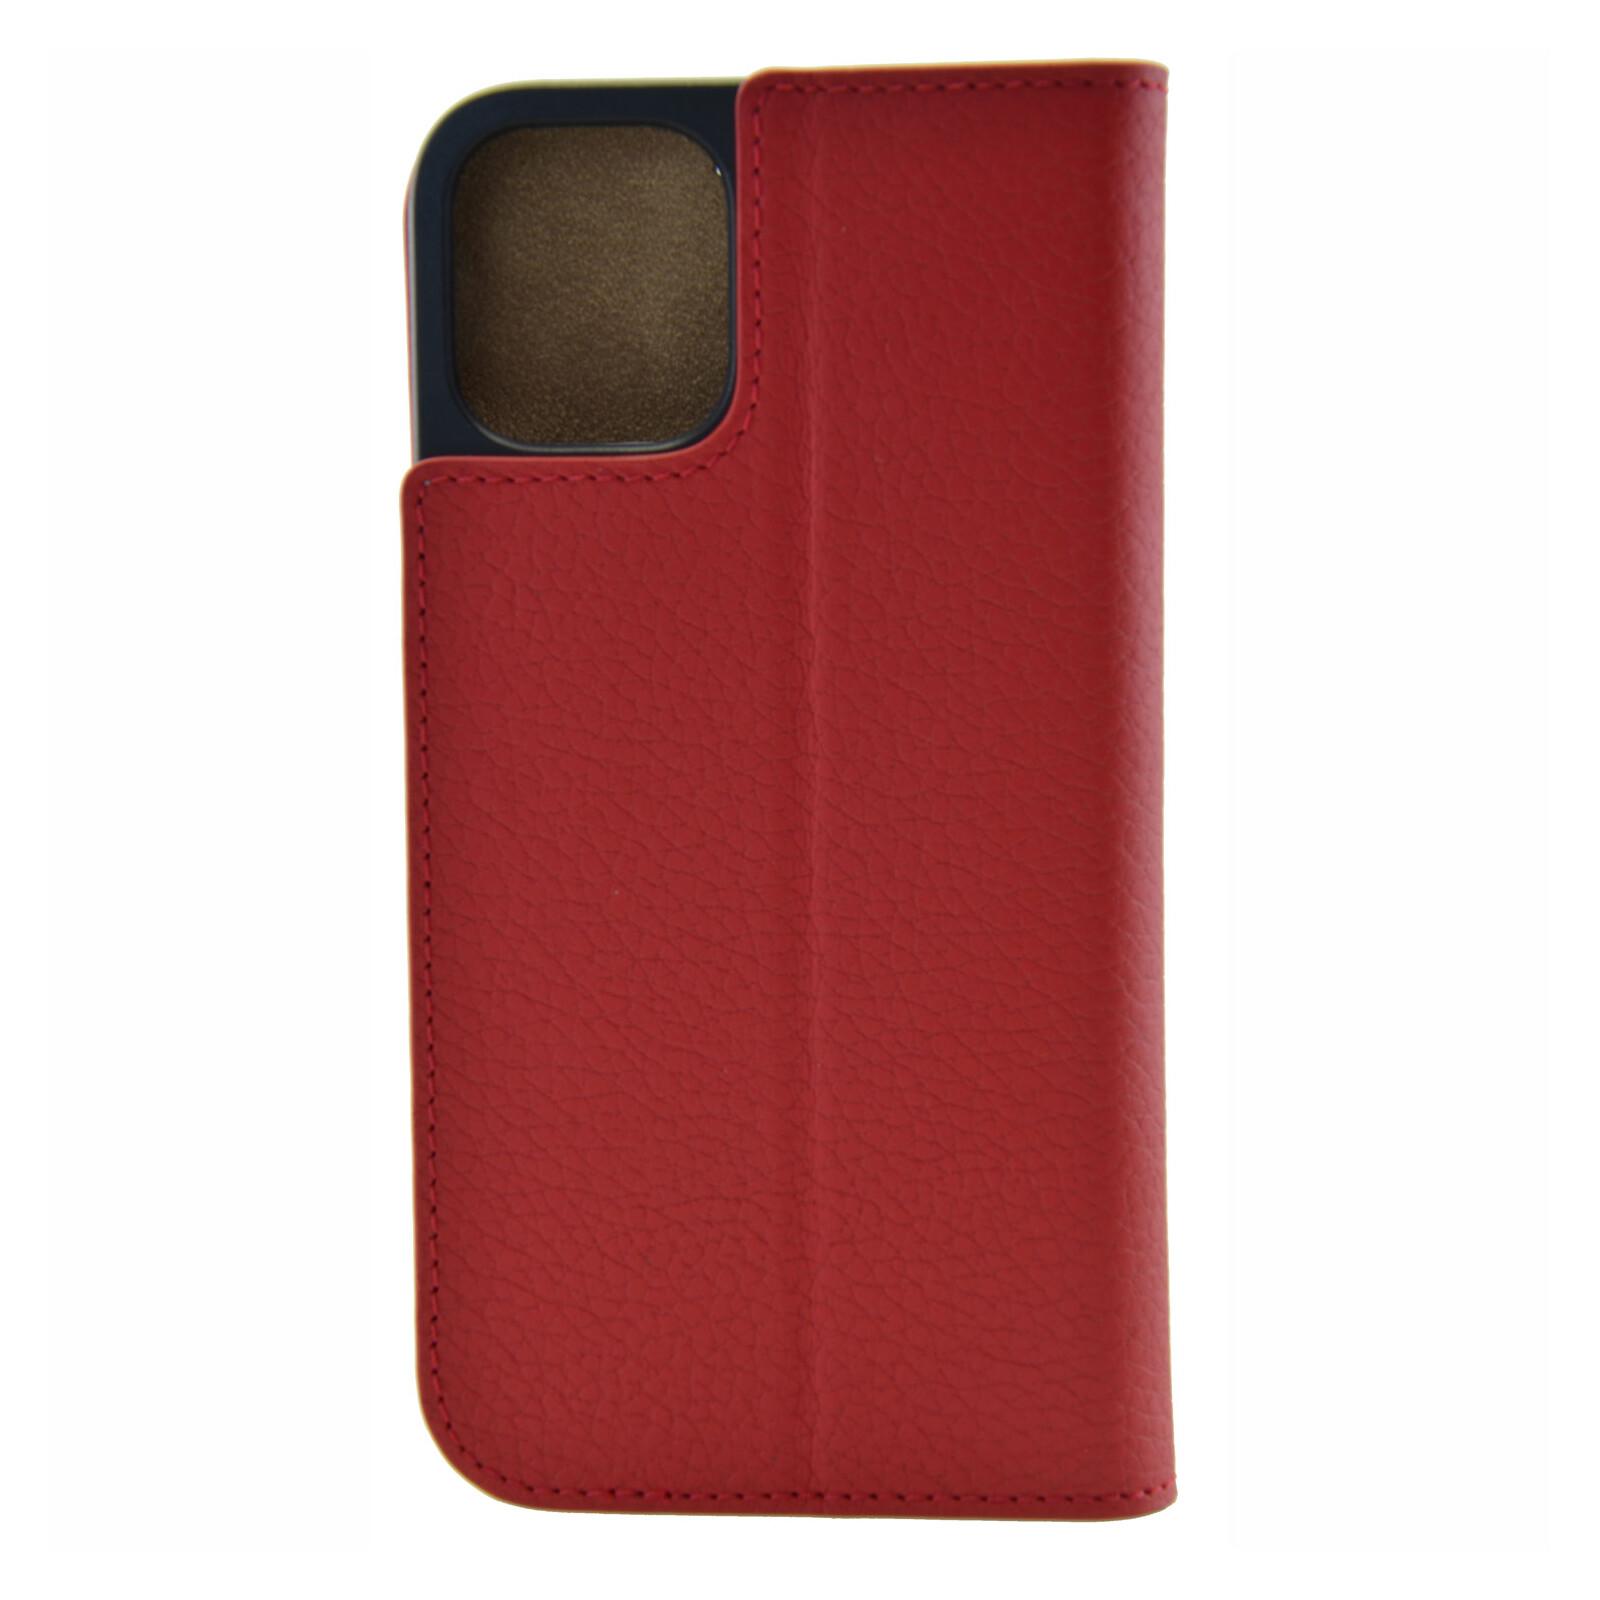 Galeli Booktasche MARC Apple iPhone 12 swiss red